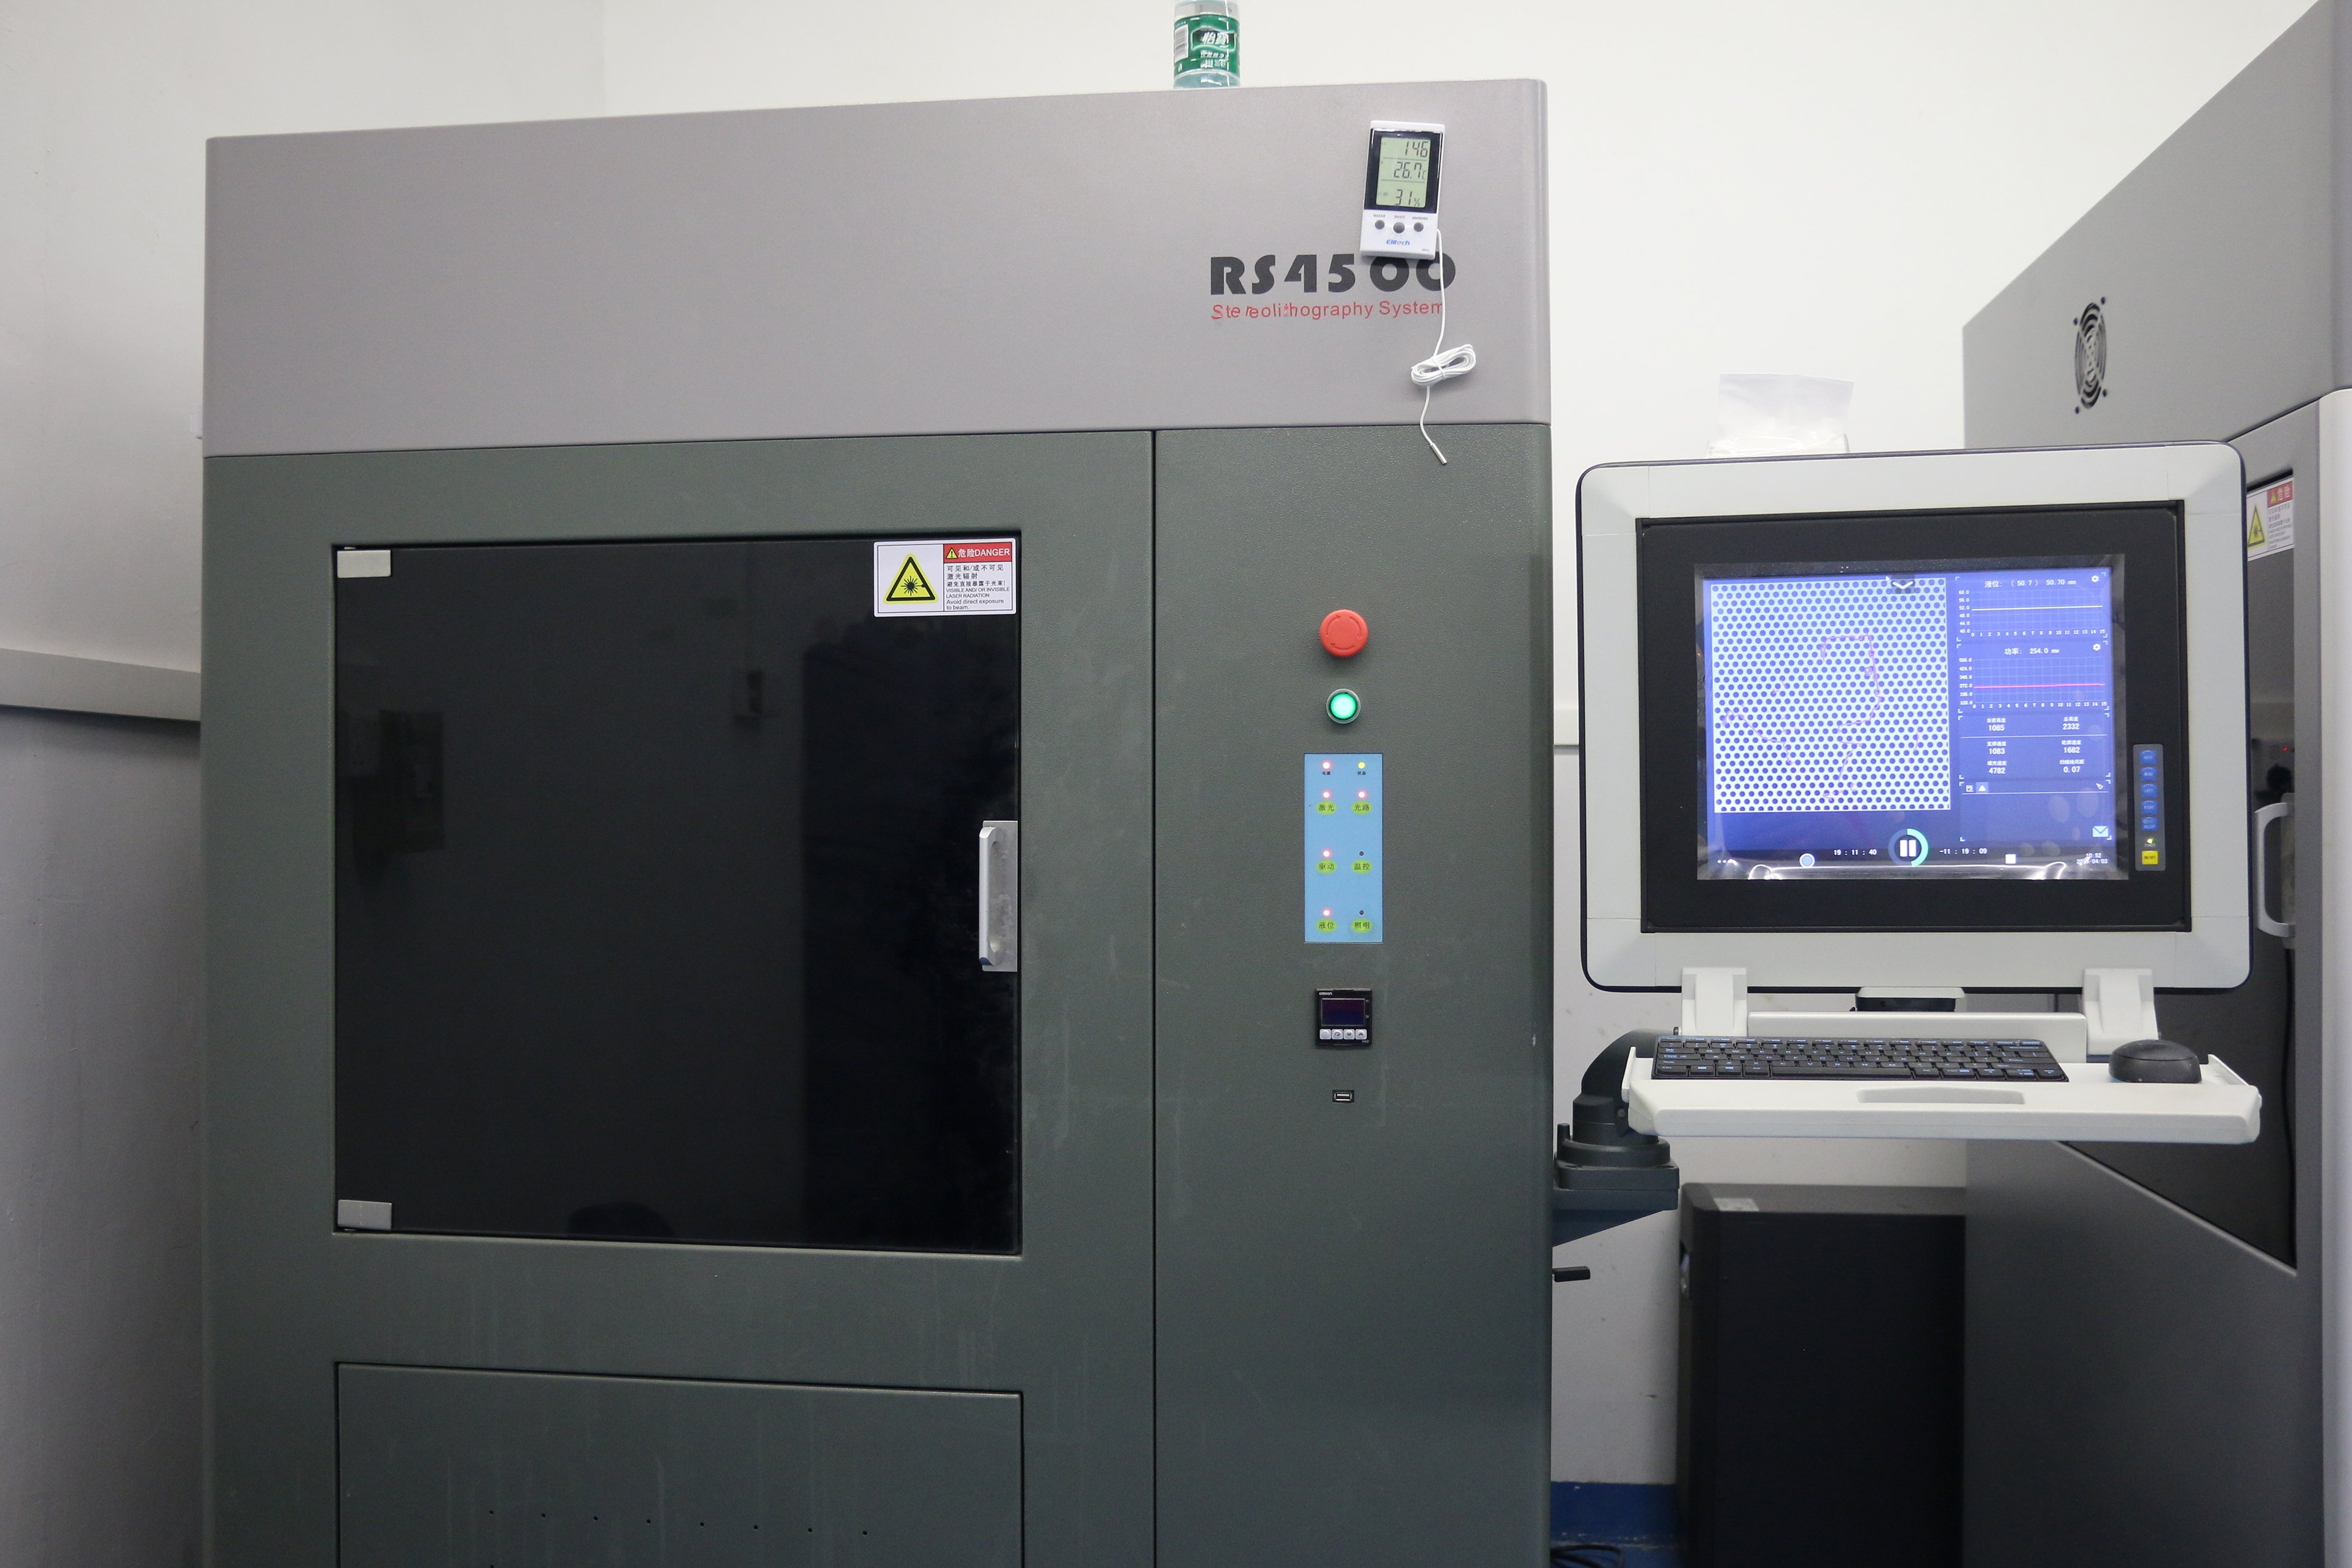 impressao 3D